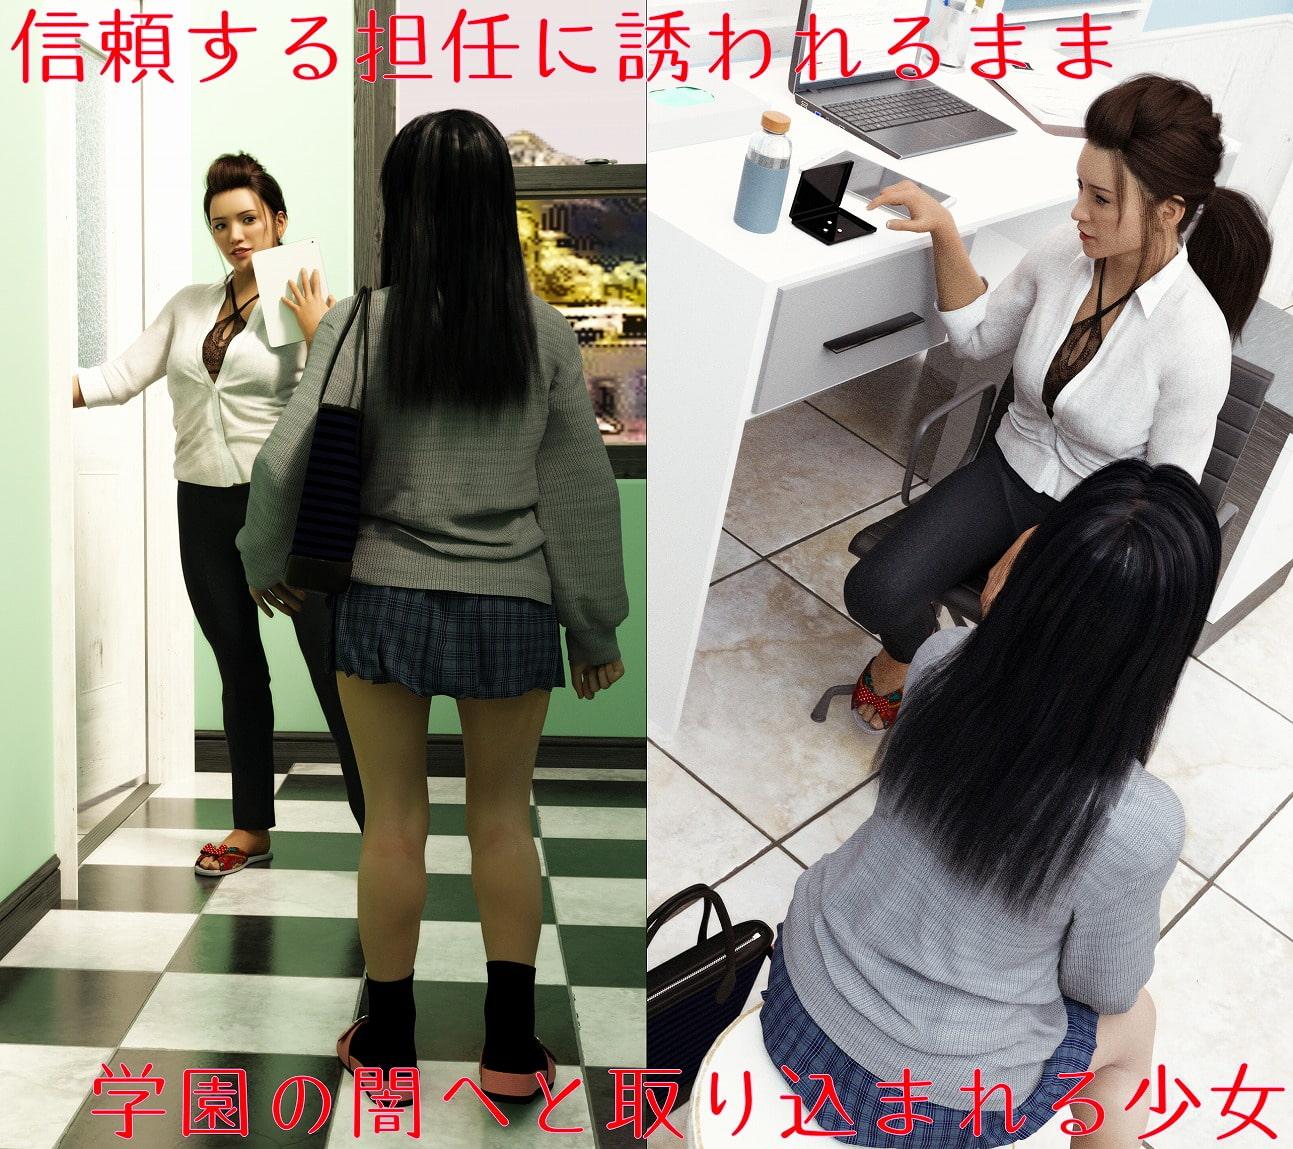 RJ323153 裏垢女子03『紗優(サユ)-Sayu-』 [20210424]